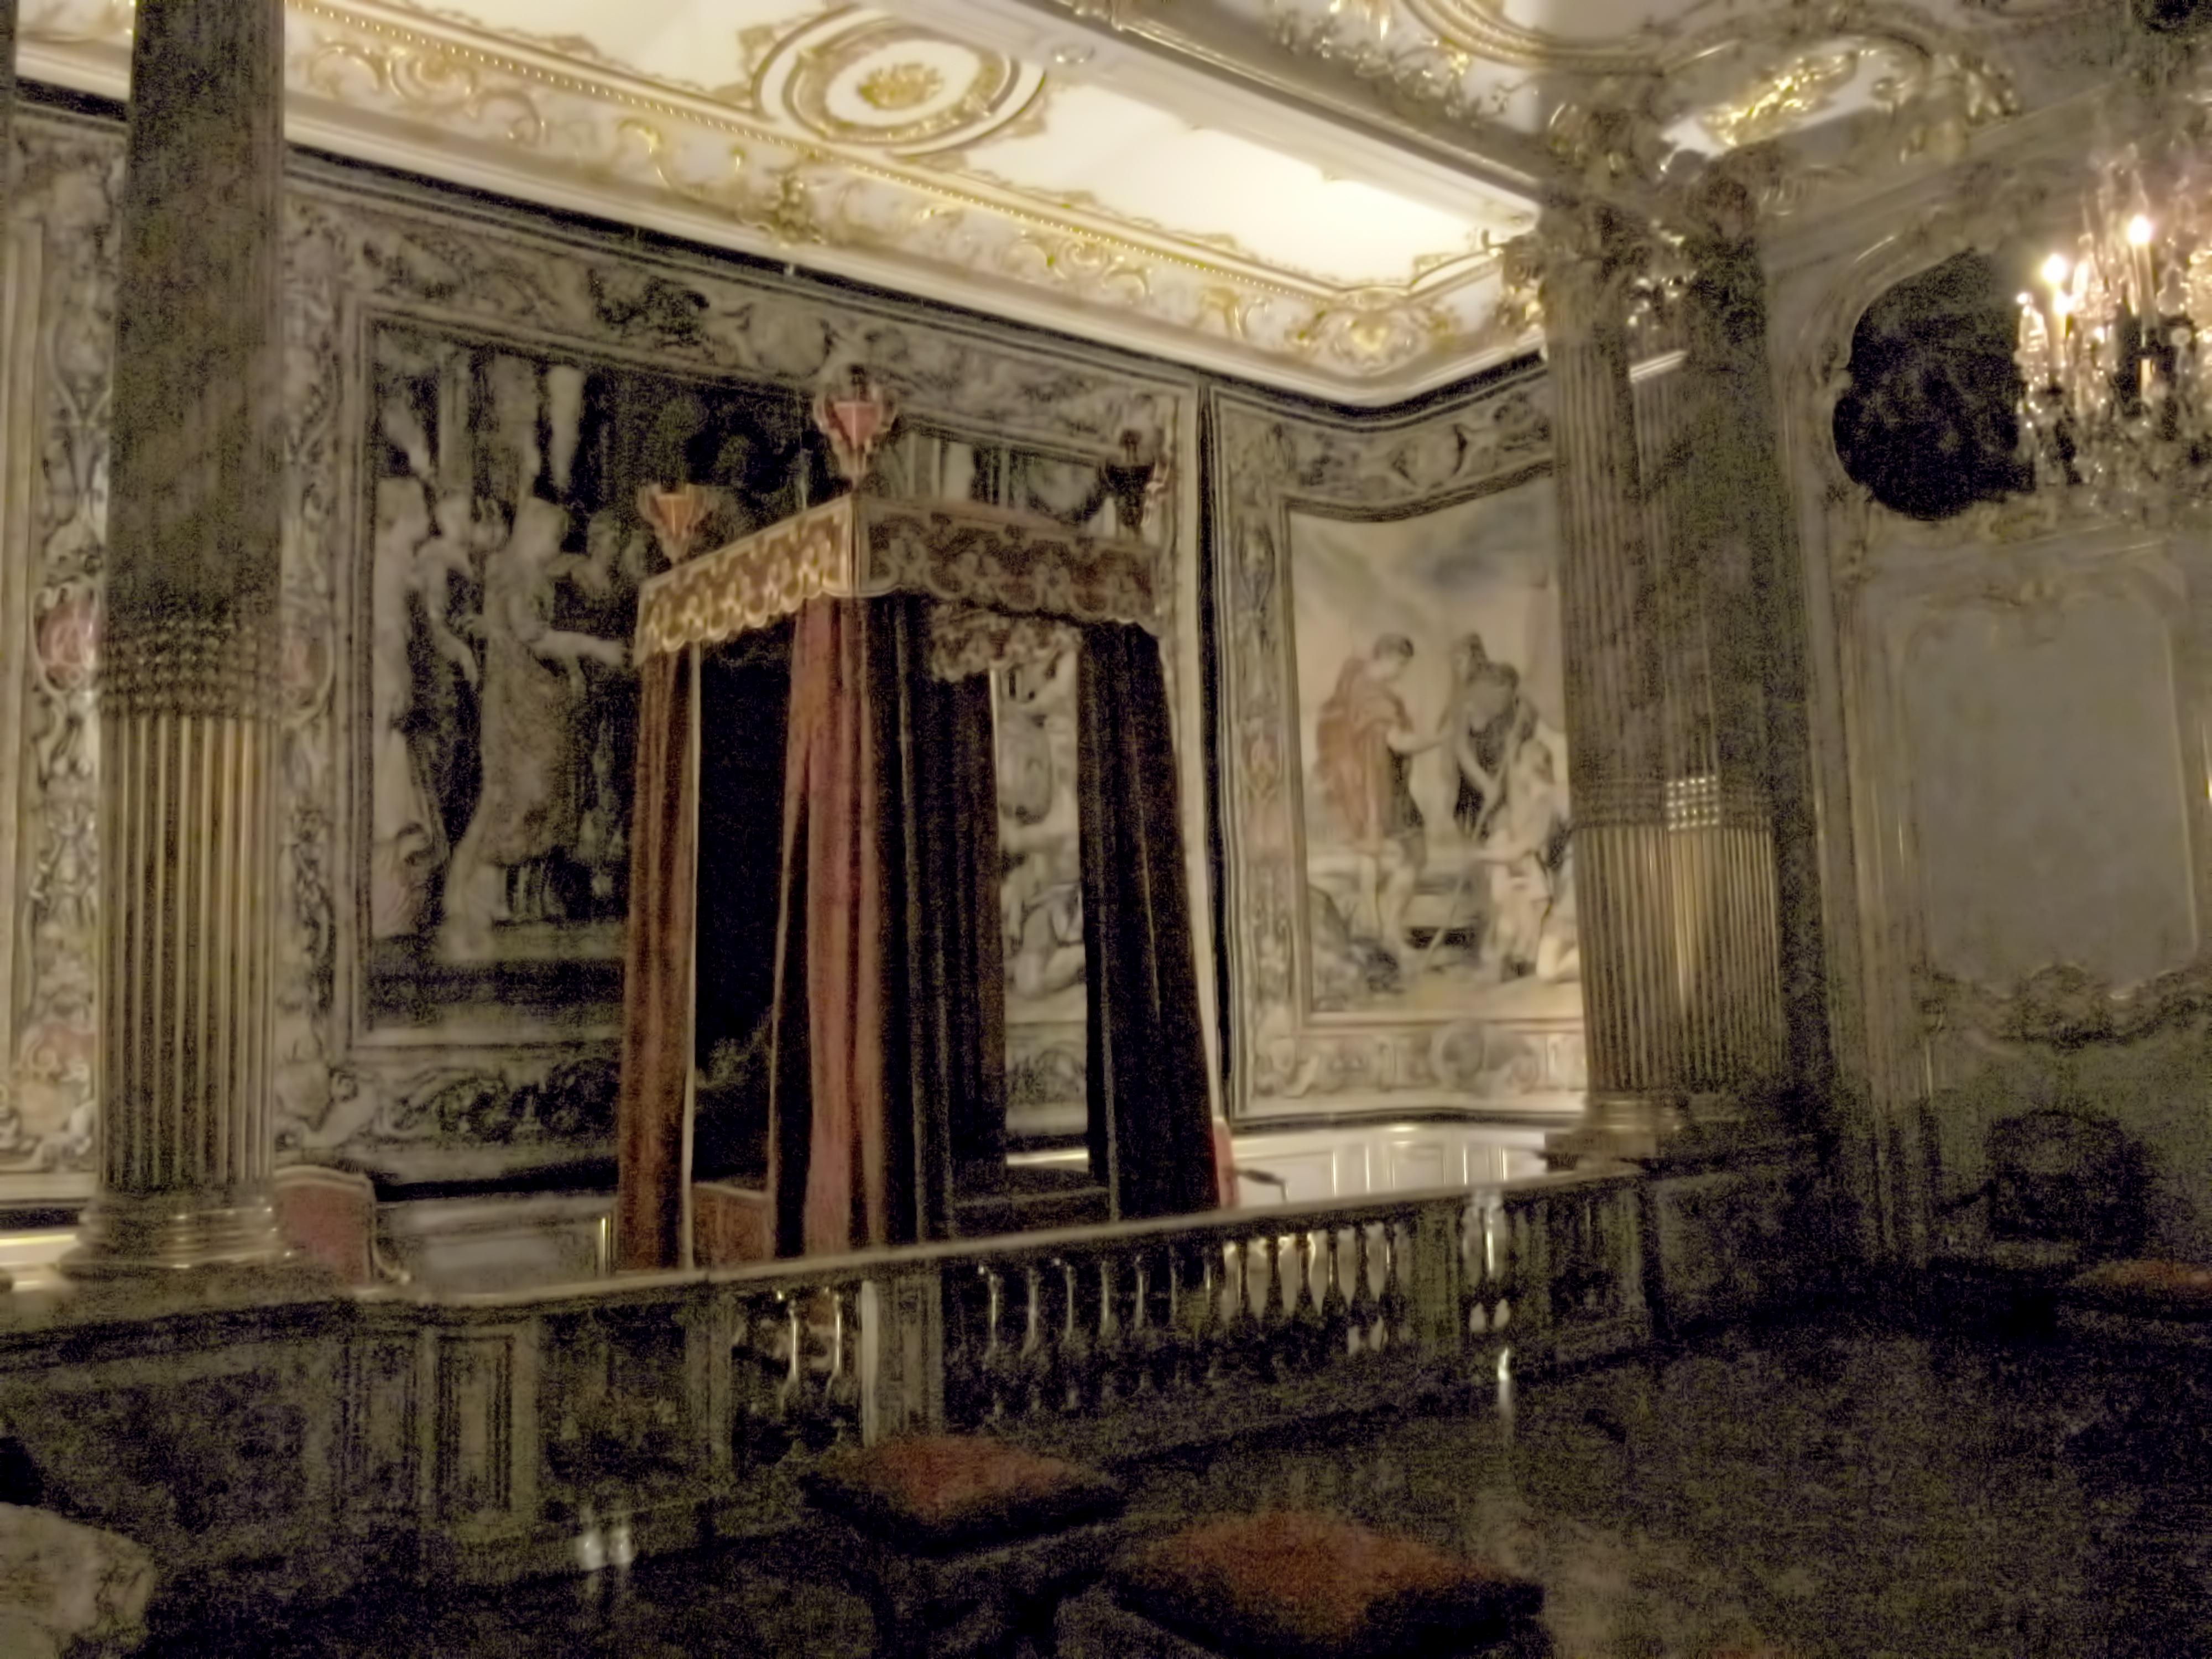 File Palais Rohan Chambre du roi la nuit MJ Wikimedia mons